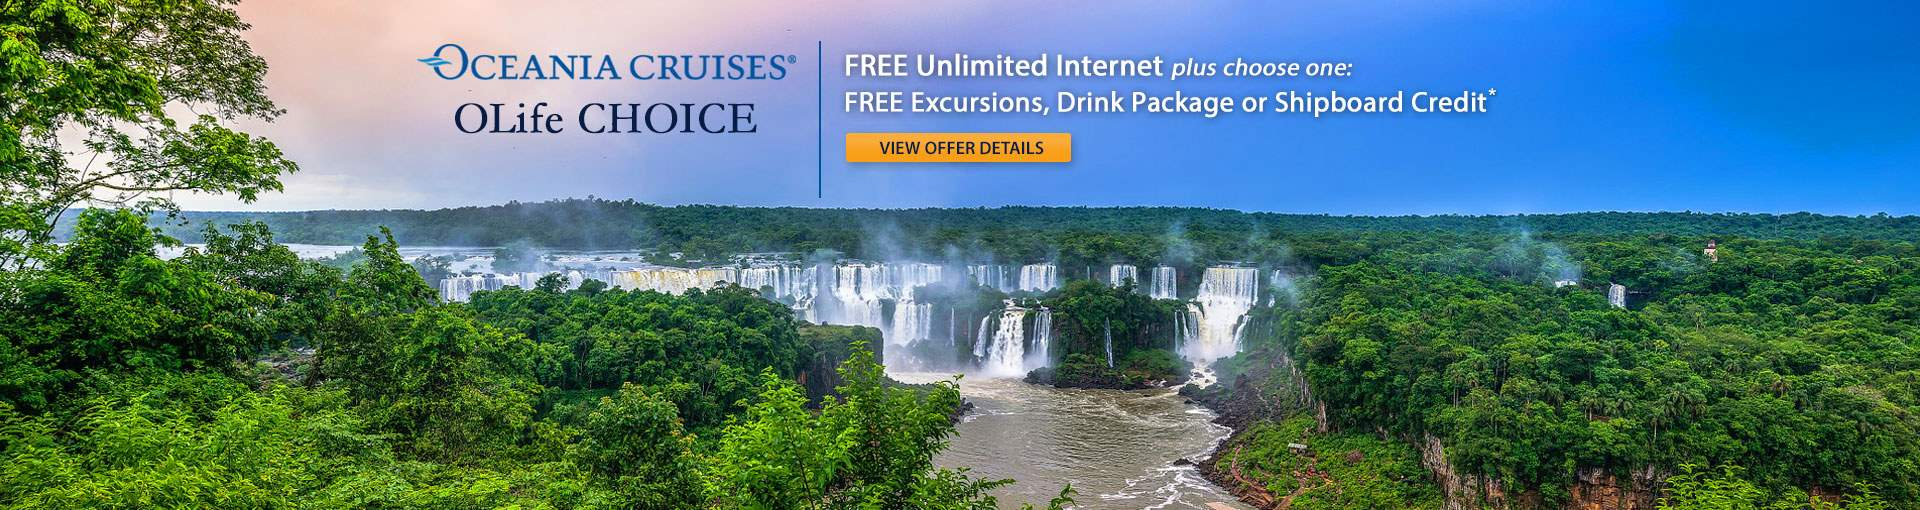 Oceania Cruises: OLife Choice Sale